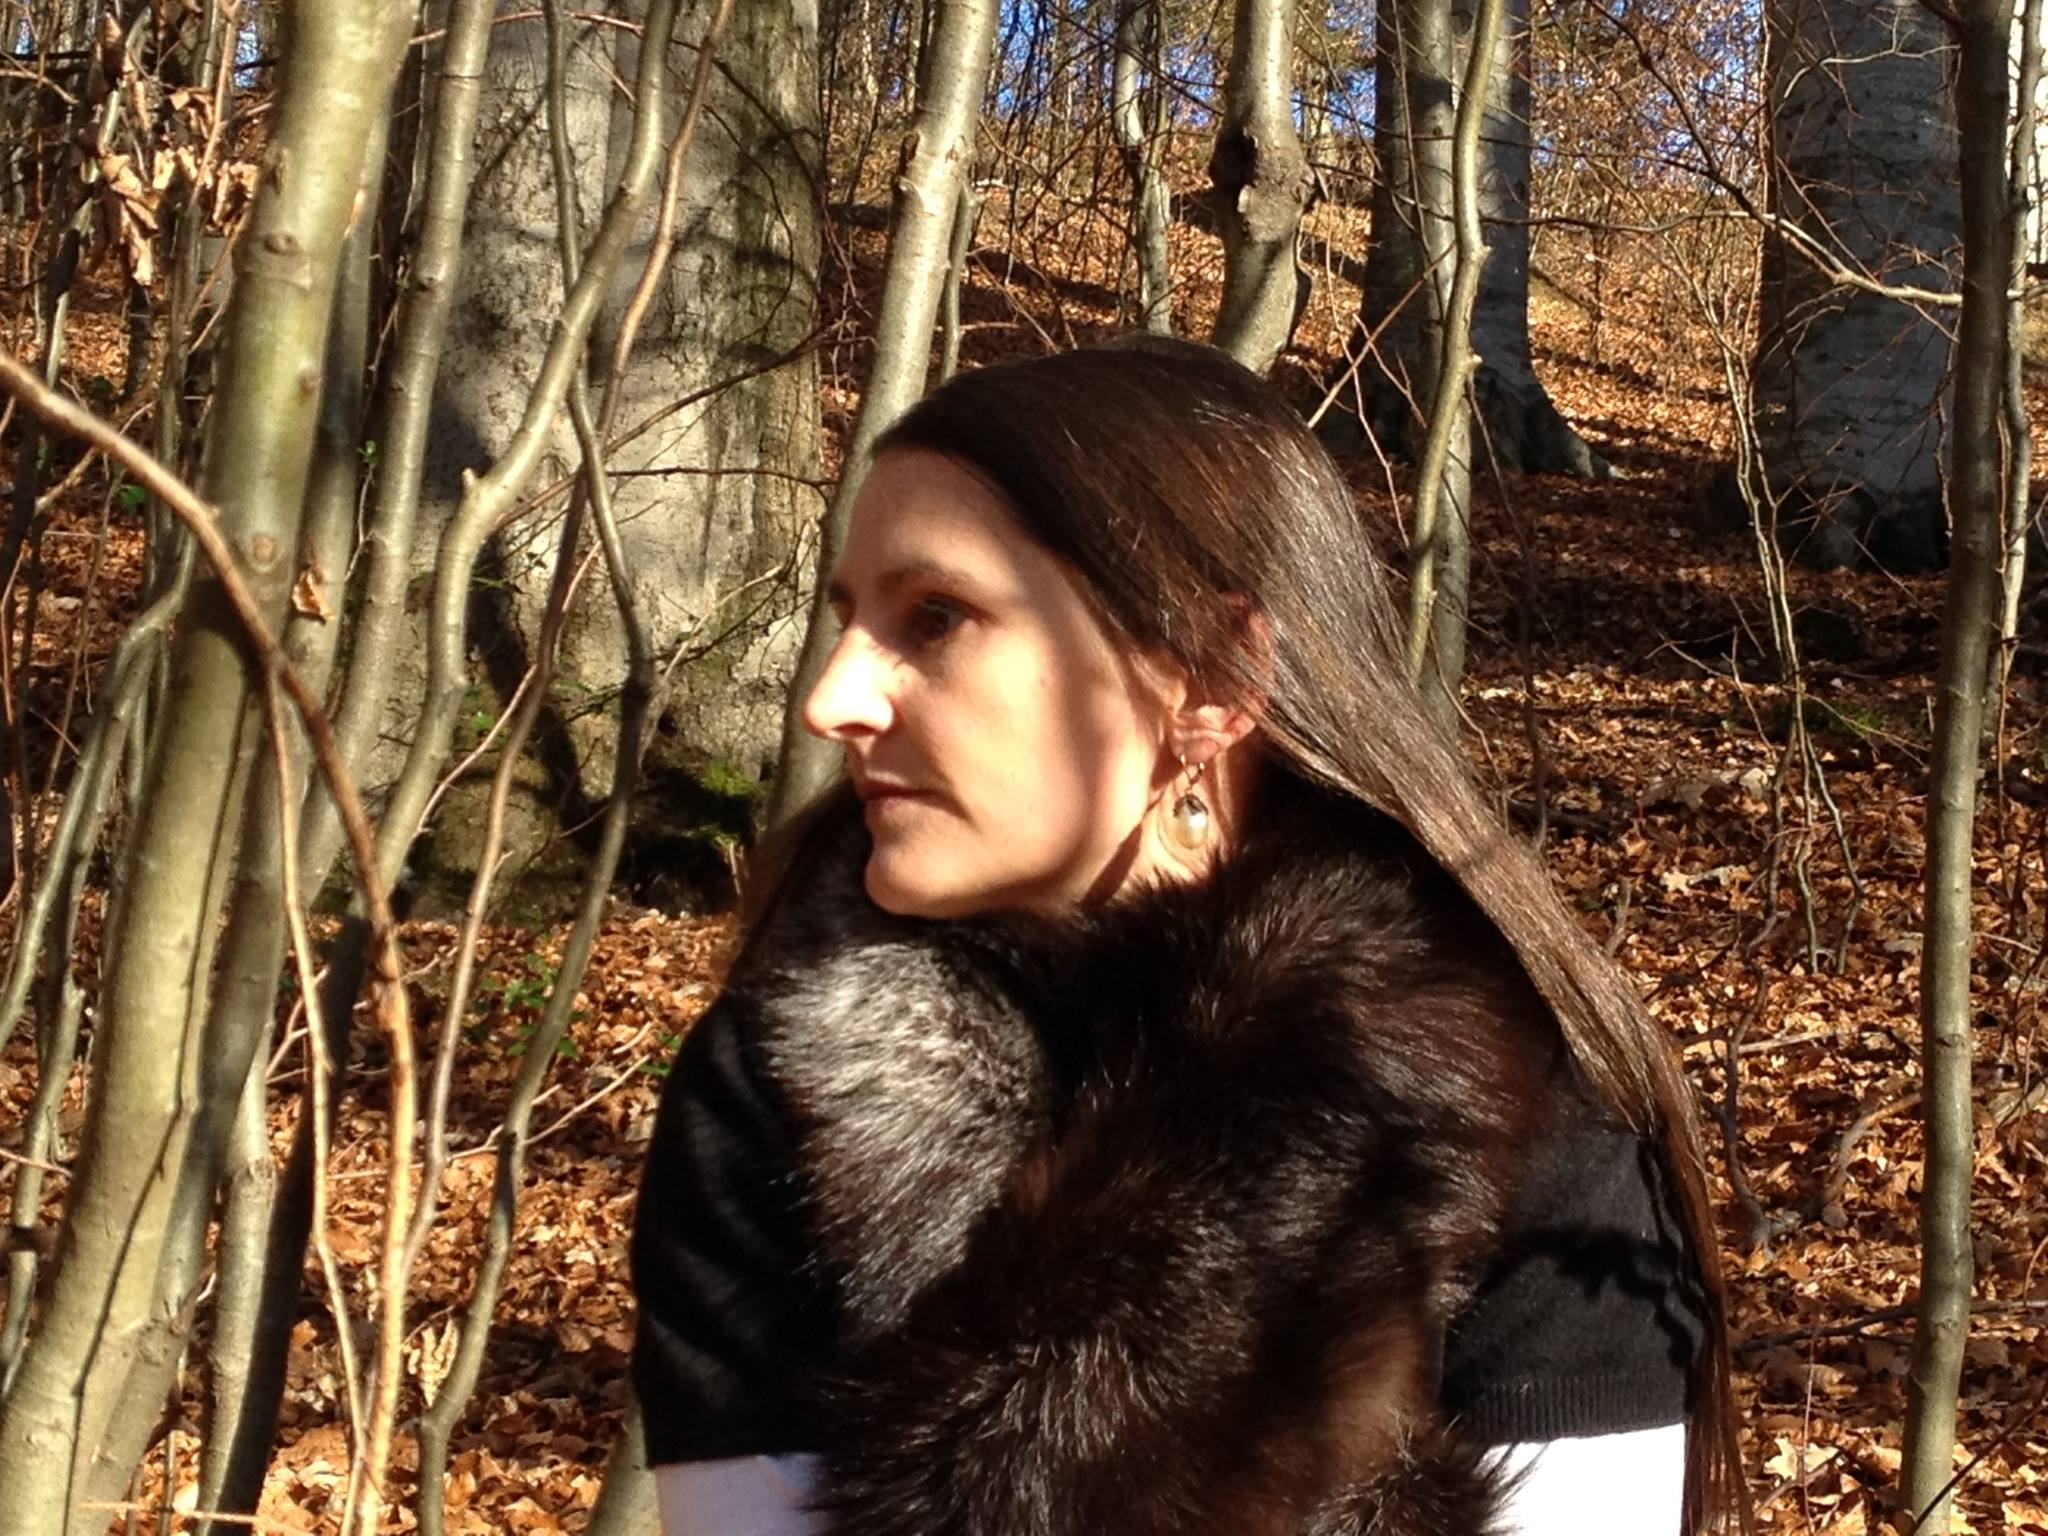 Annabelle Wimmer Bakic | Salon21